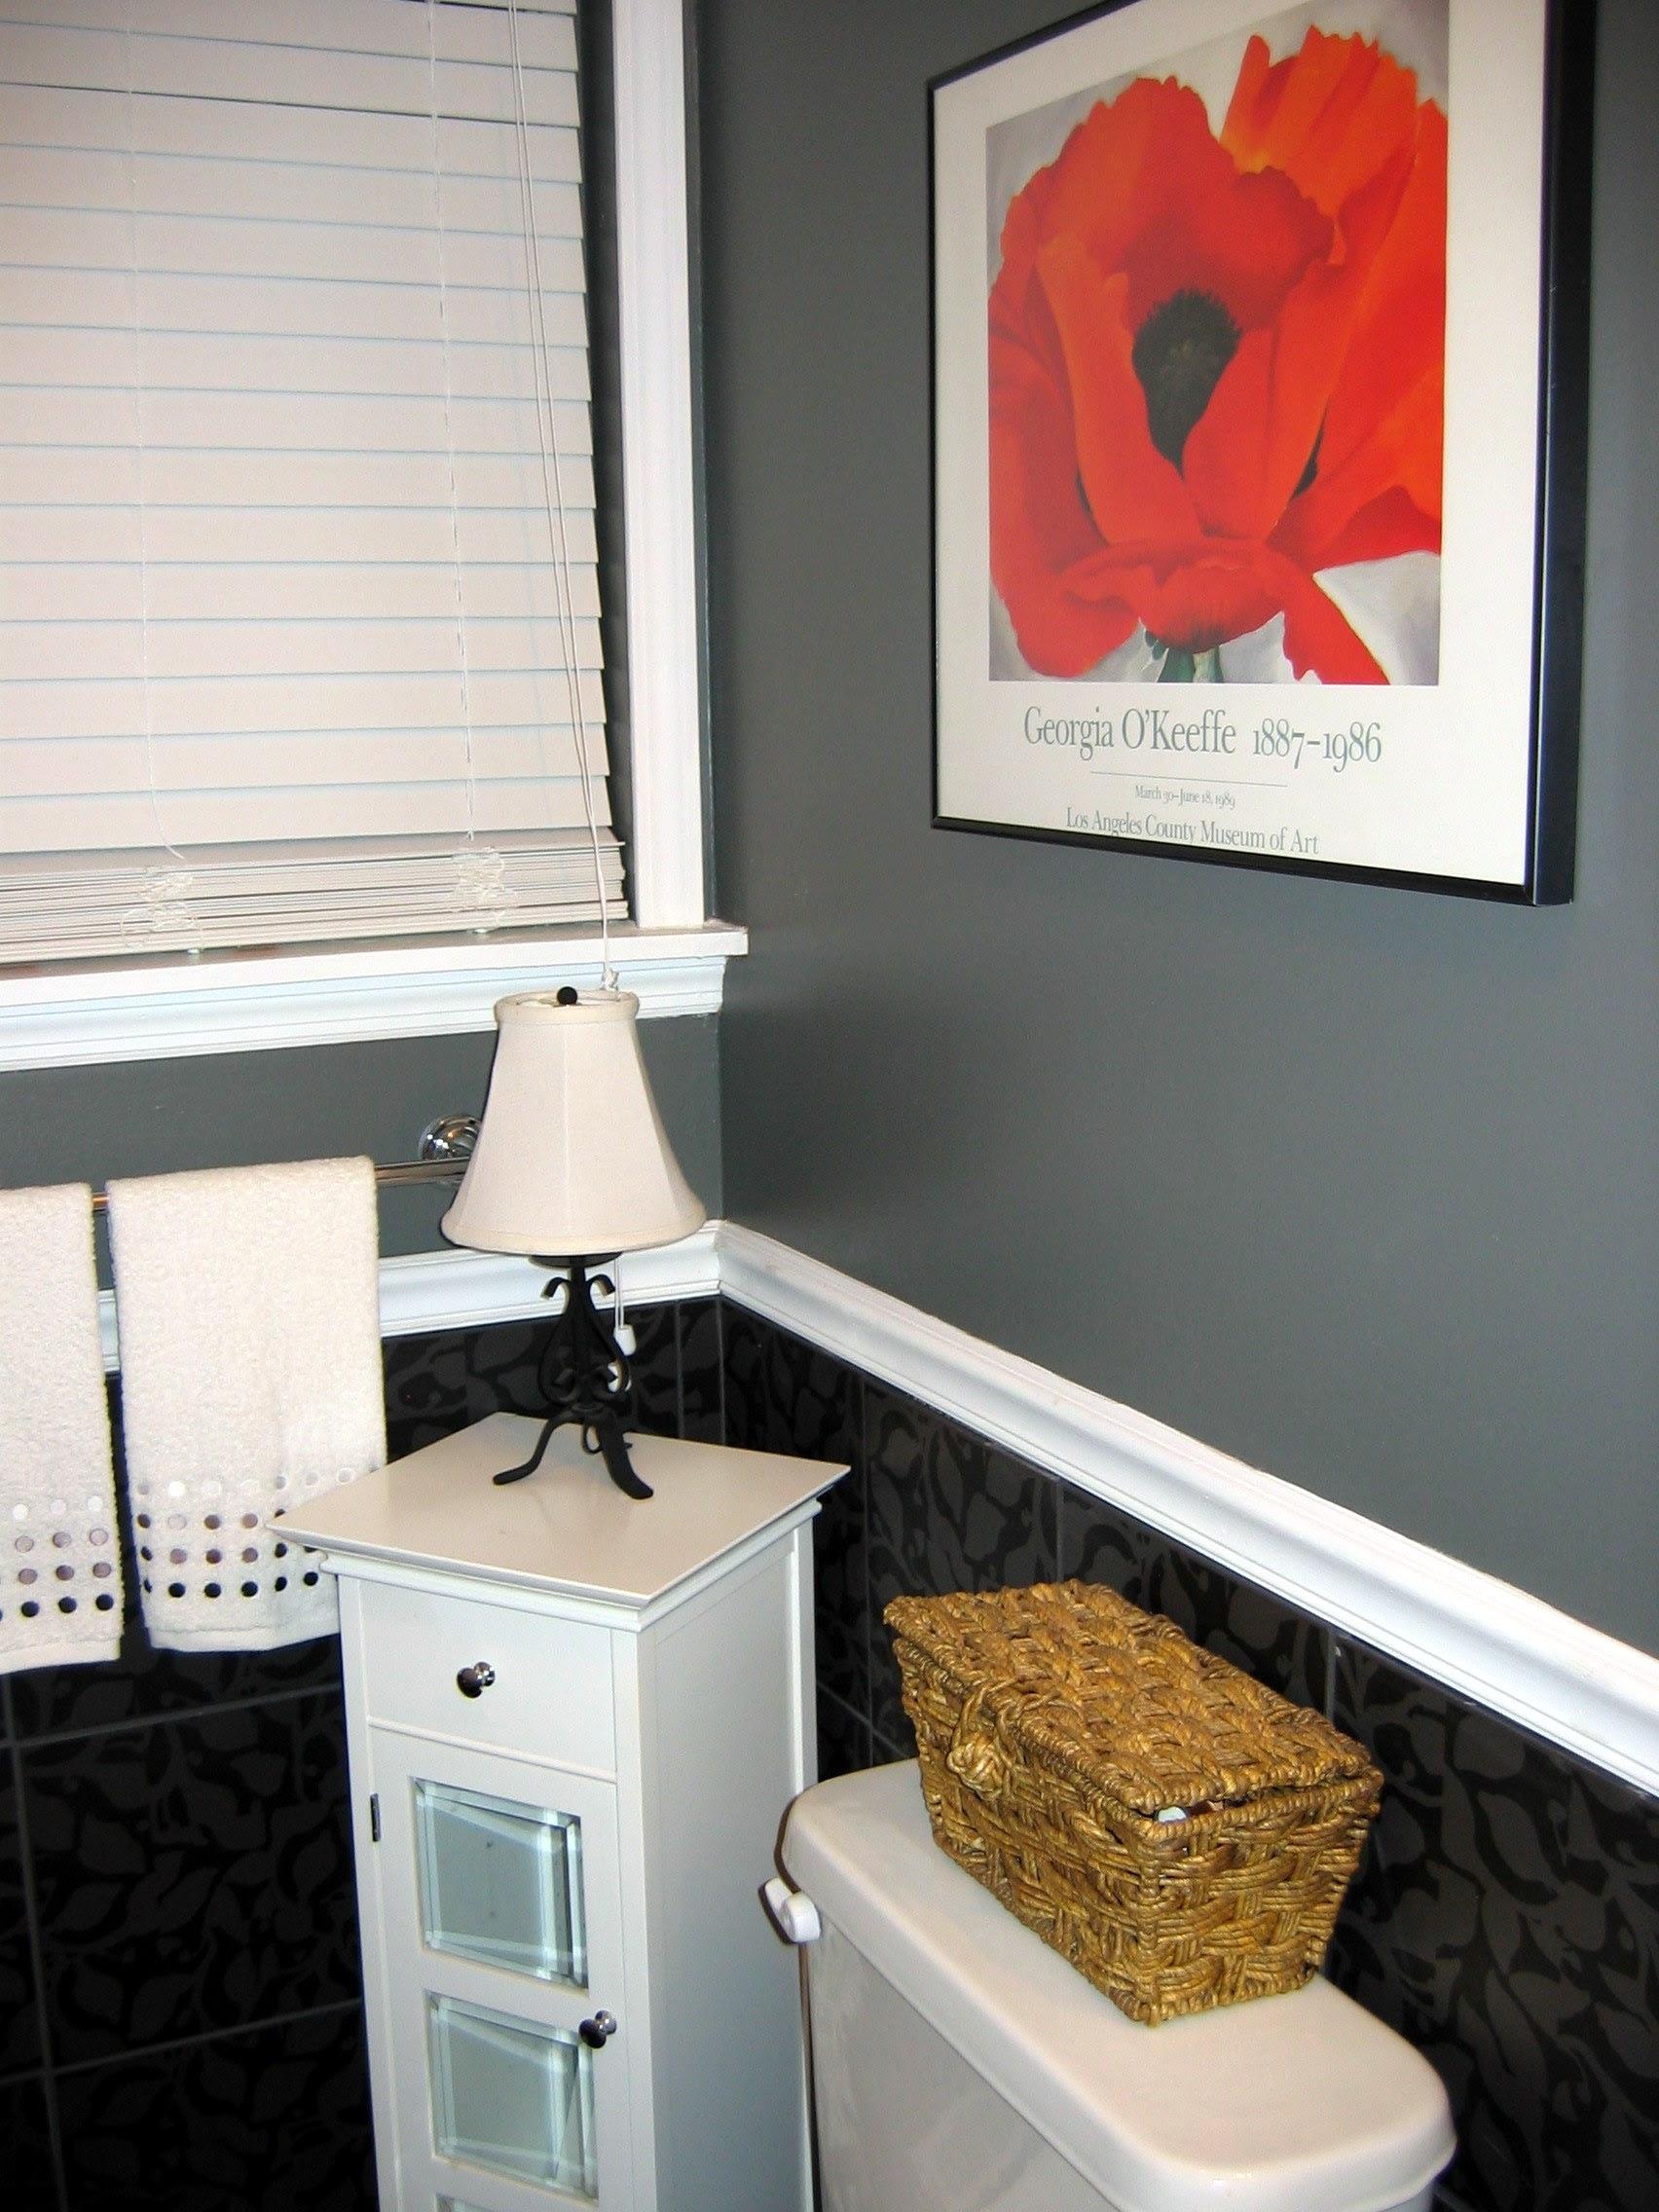 Shower Curtain Monogram | Janice Ferguson Sews